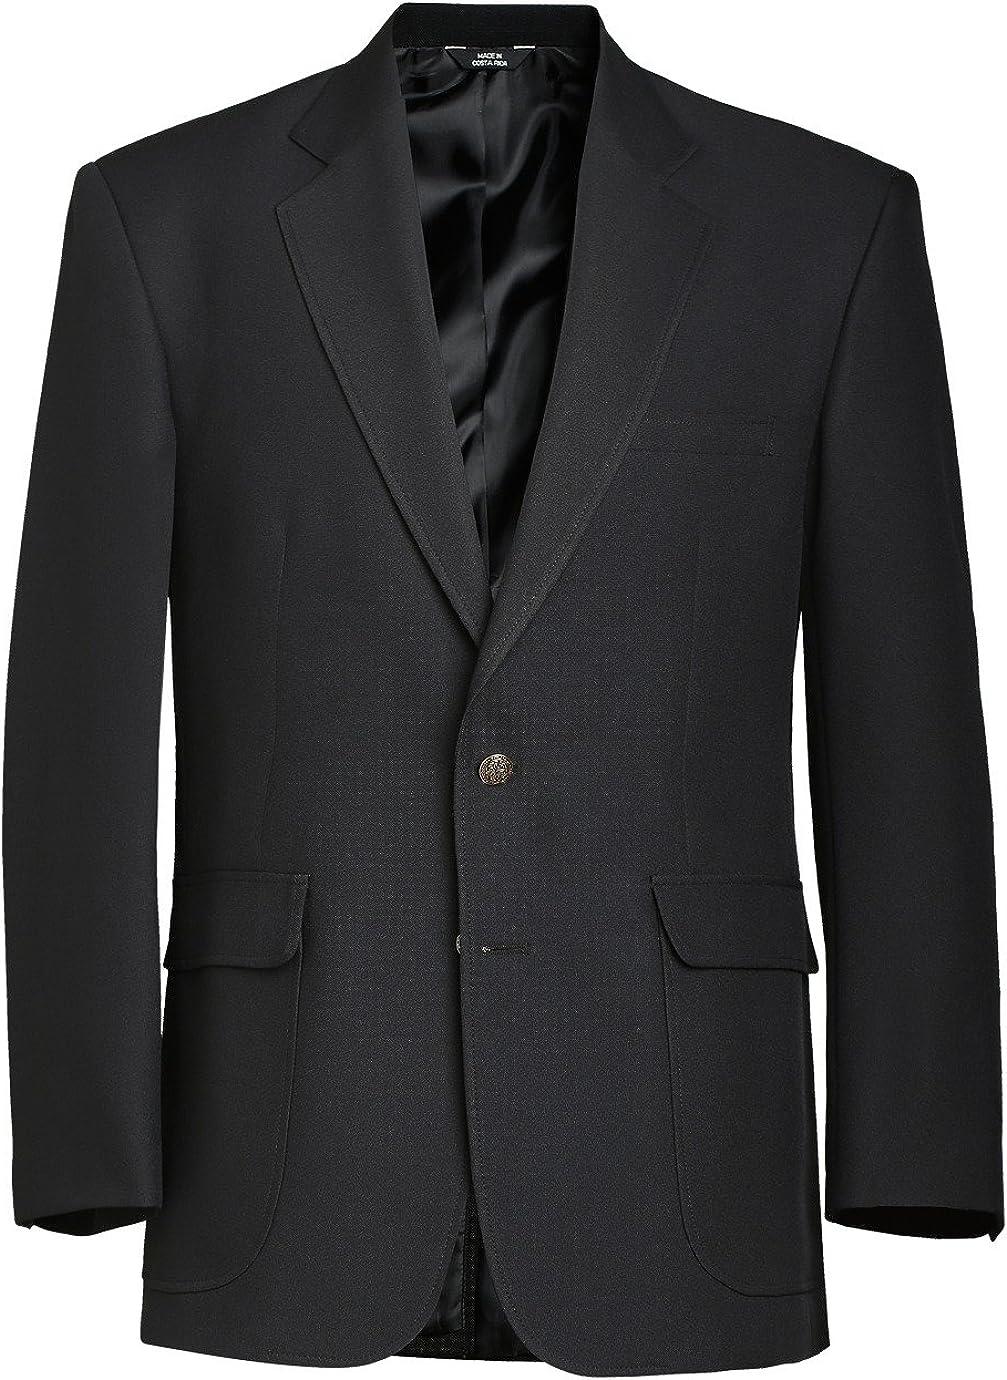 Edwards Men's Classic Two Button Single Breasted Blazer, Black, 38 Regular